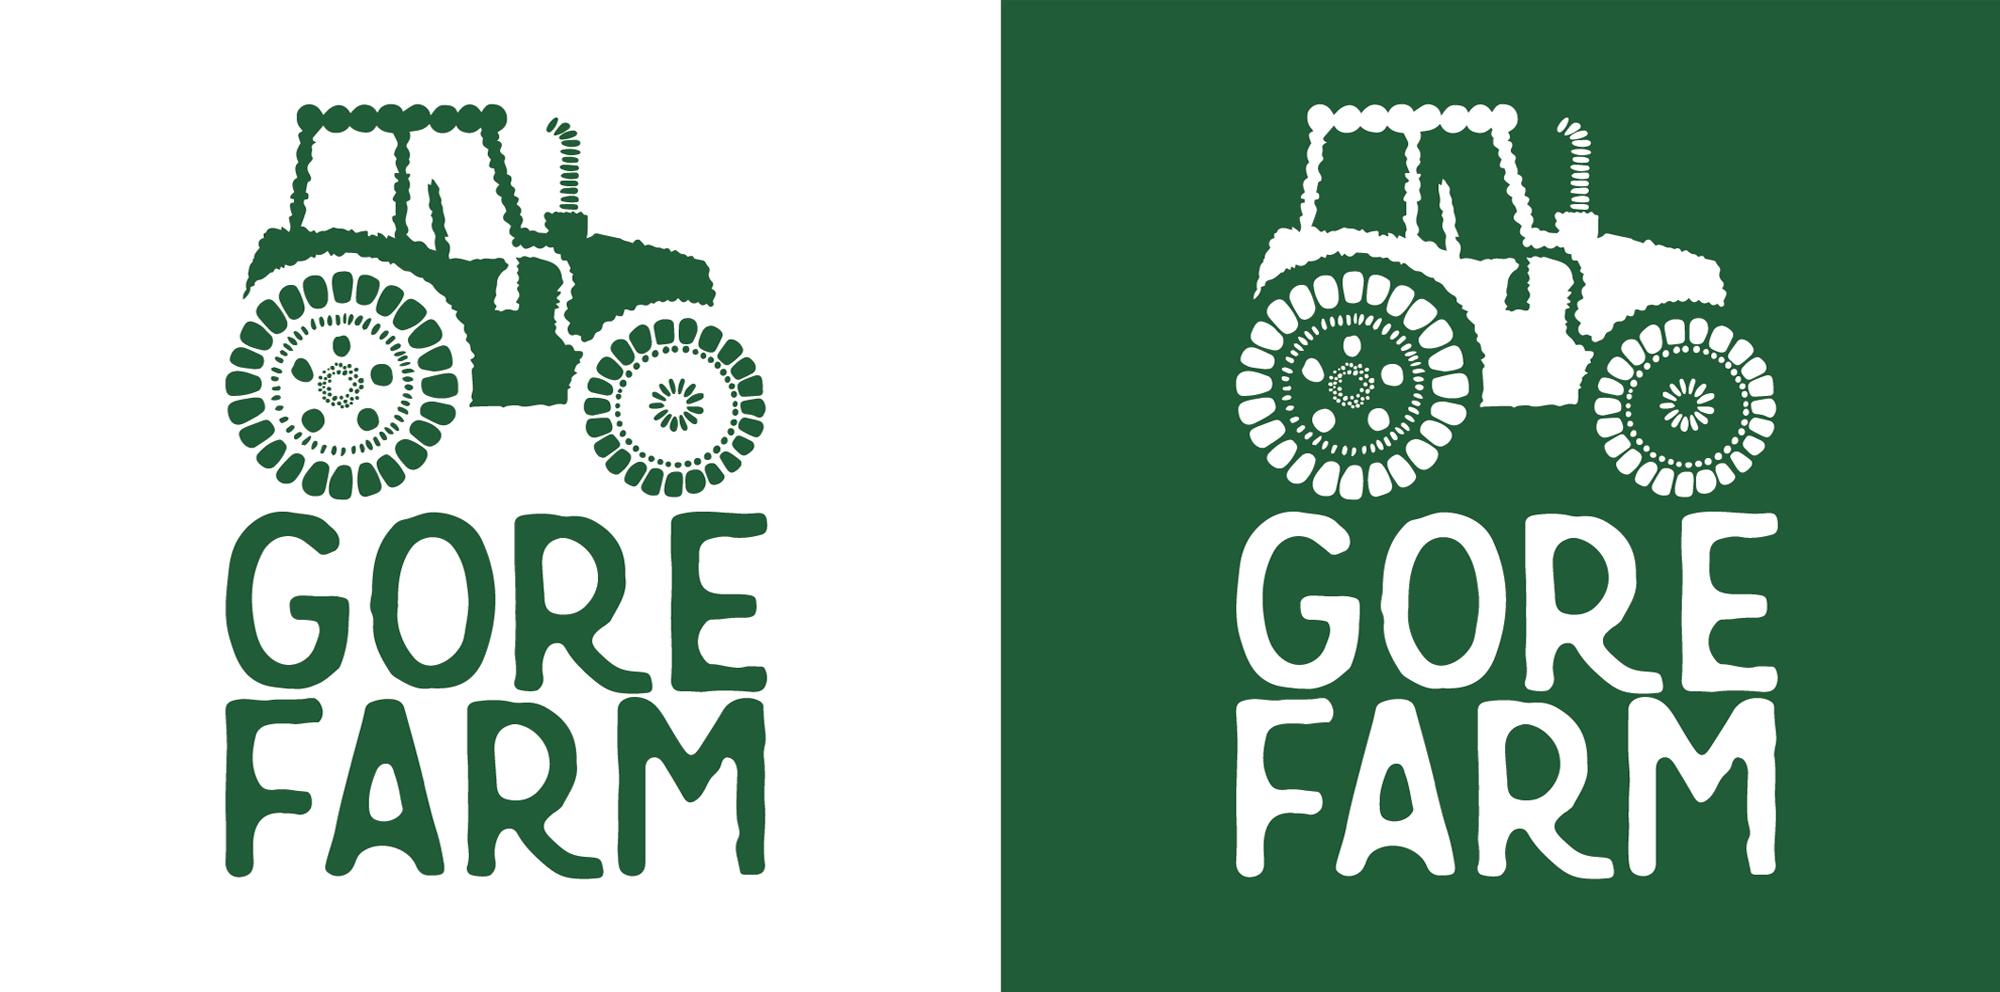 Gore logo farm logo - The Ernest Cook Trust